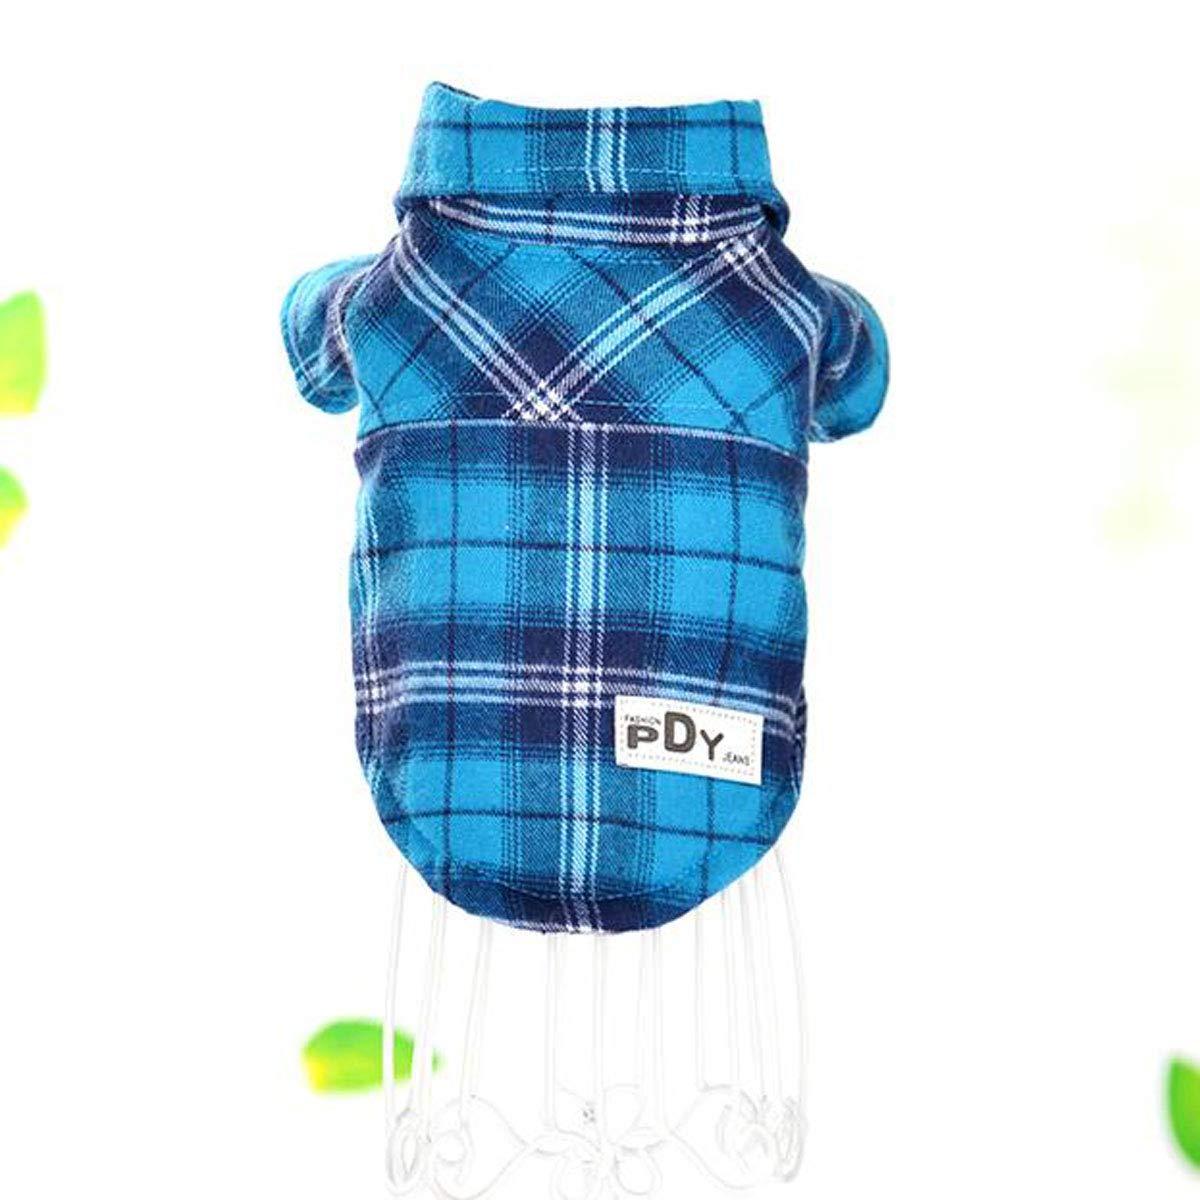 bluee S bluee S Pet and Winter Wear, Pomeranian VIP Dog, Casual Plus Velvet Plaid Shirt (color   bluee, Size   S)